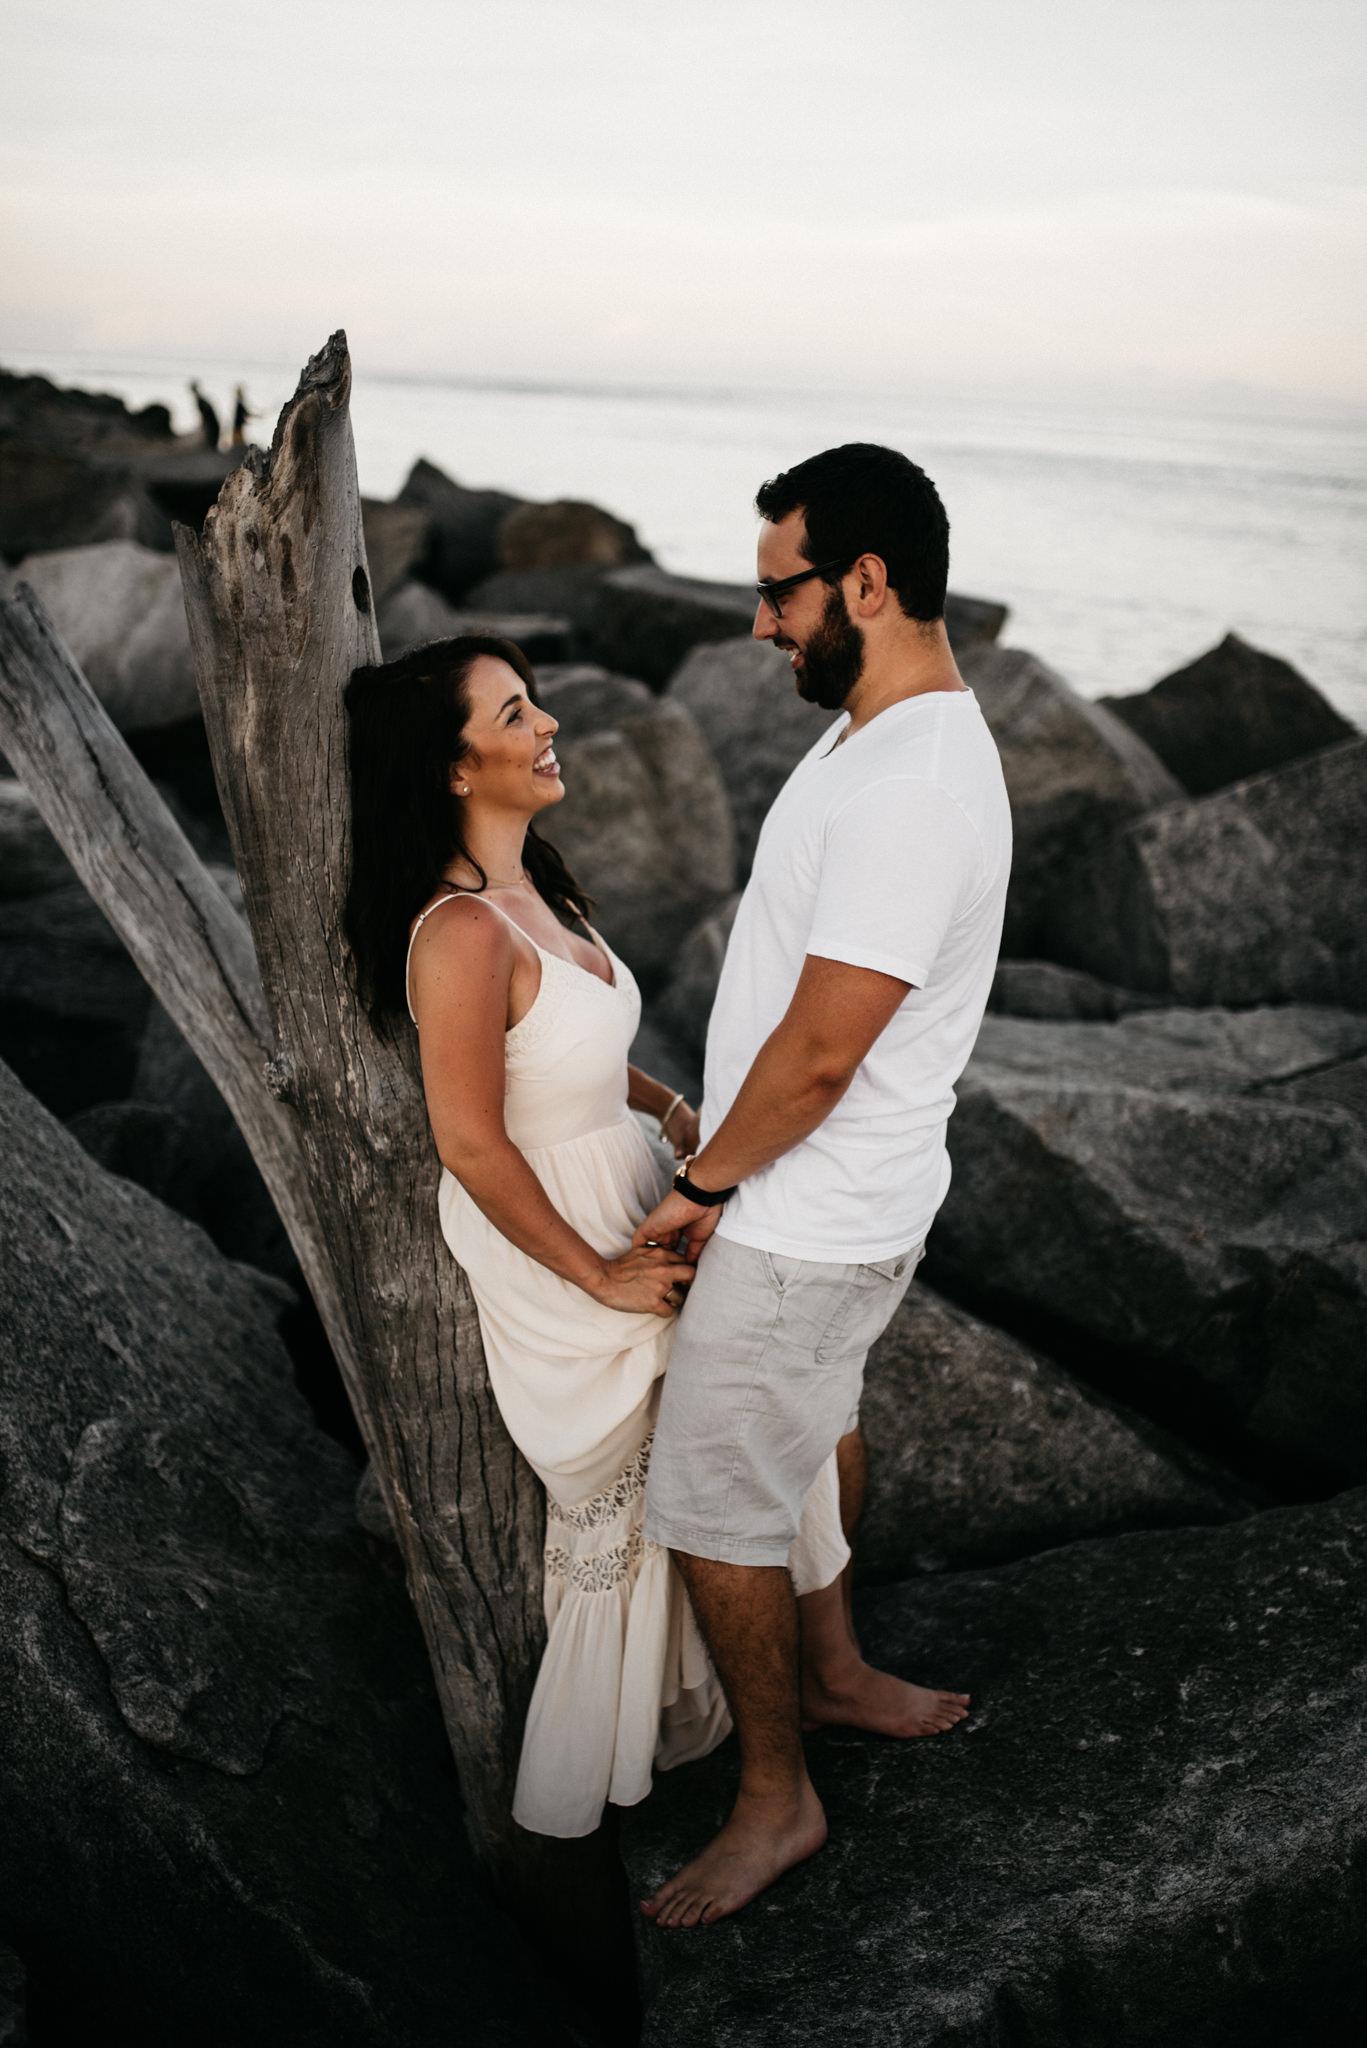 twyla jones photography - treasure coast florida - romantic anniversary session at the beach--5.jpg